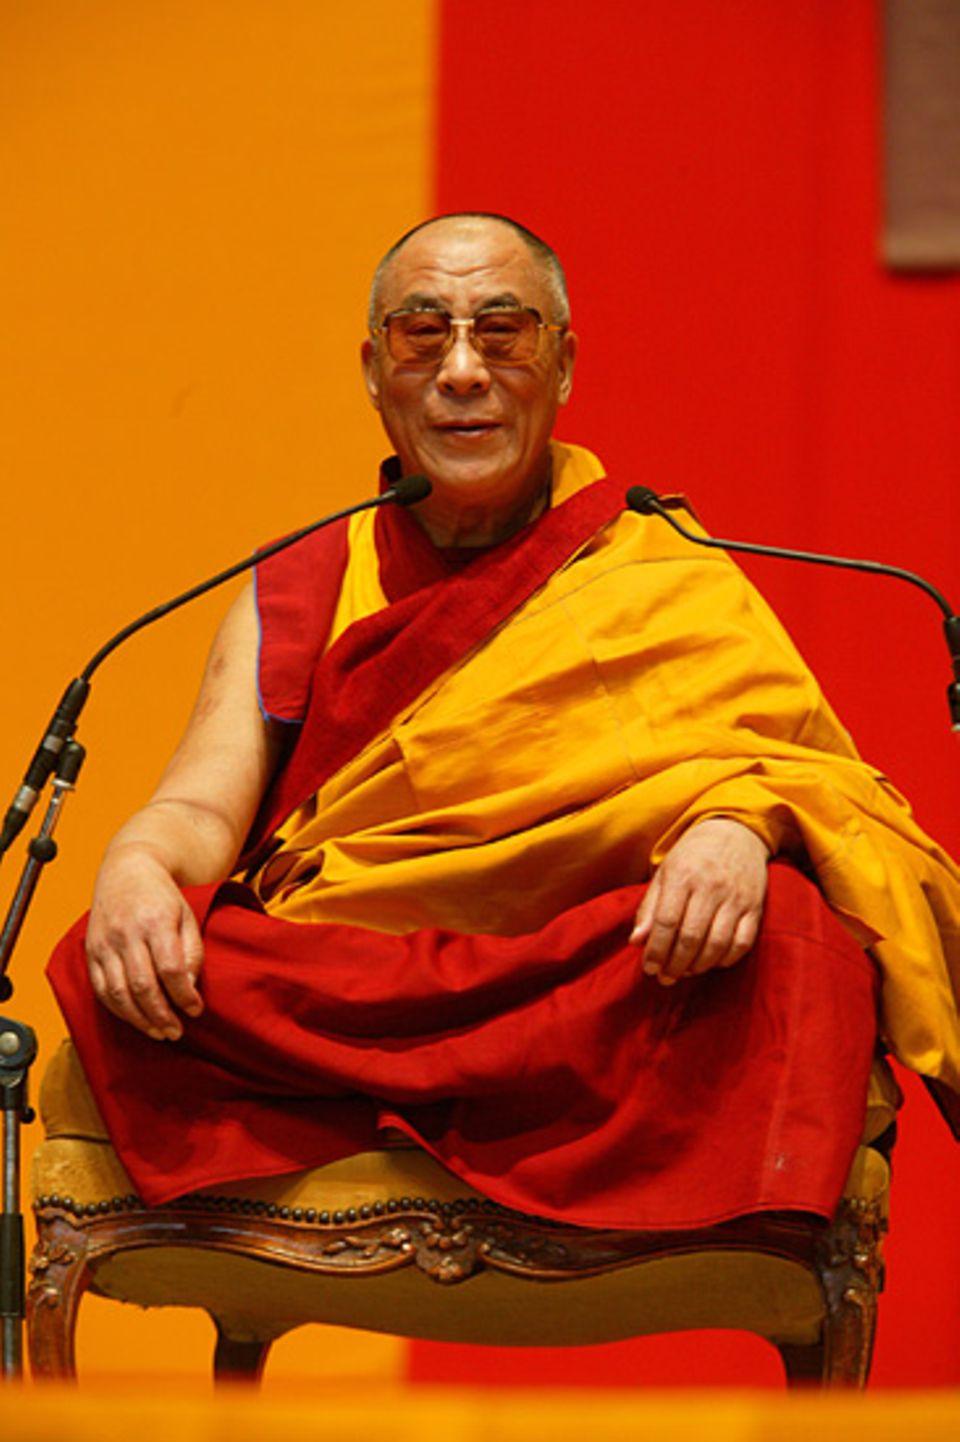 Weltreligionen: Tenzin Gyatso ist der 14. Dalai Lama